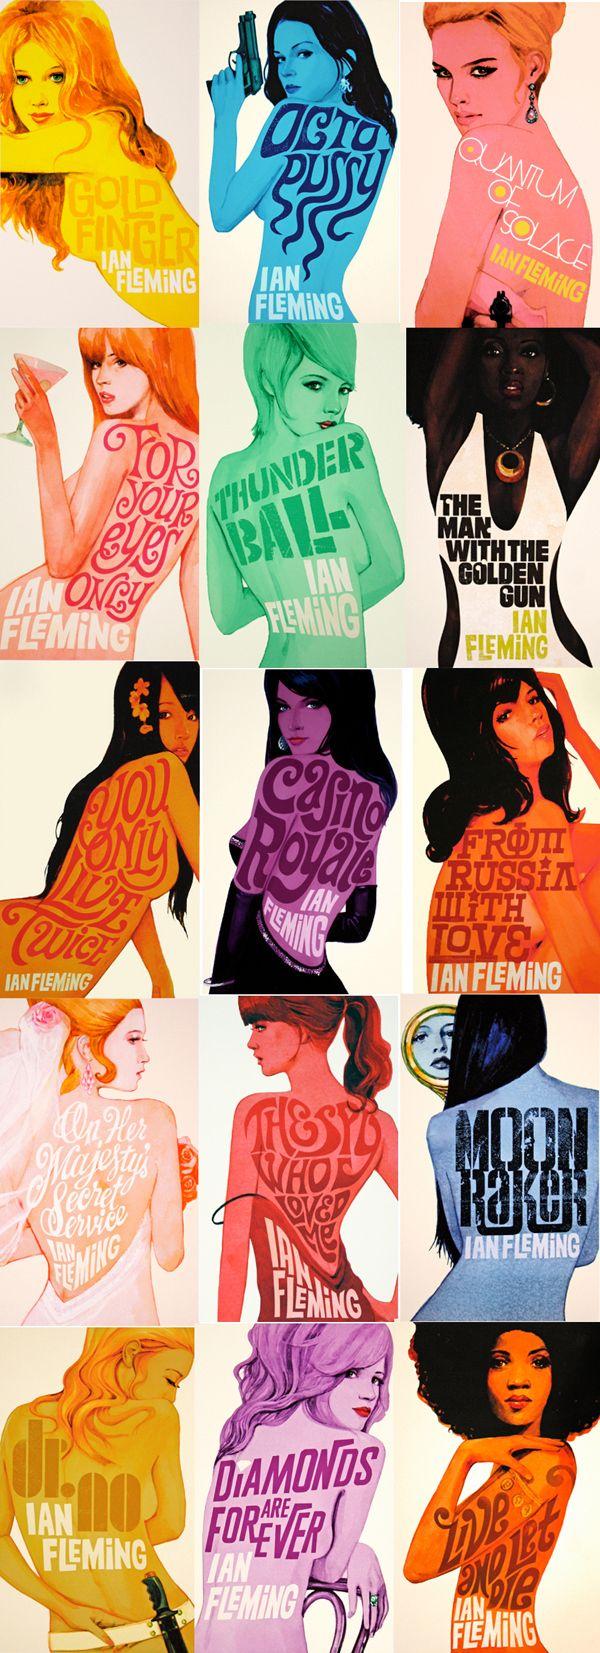 Ian Fleming's James Bond collection, designed by Michael Gillette, published by Penguin UK, 2008.